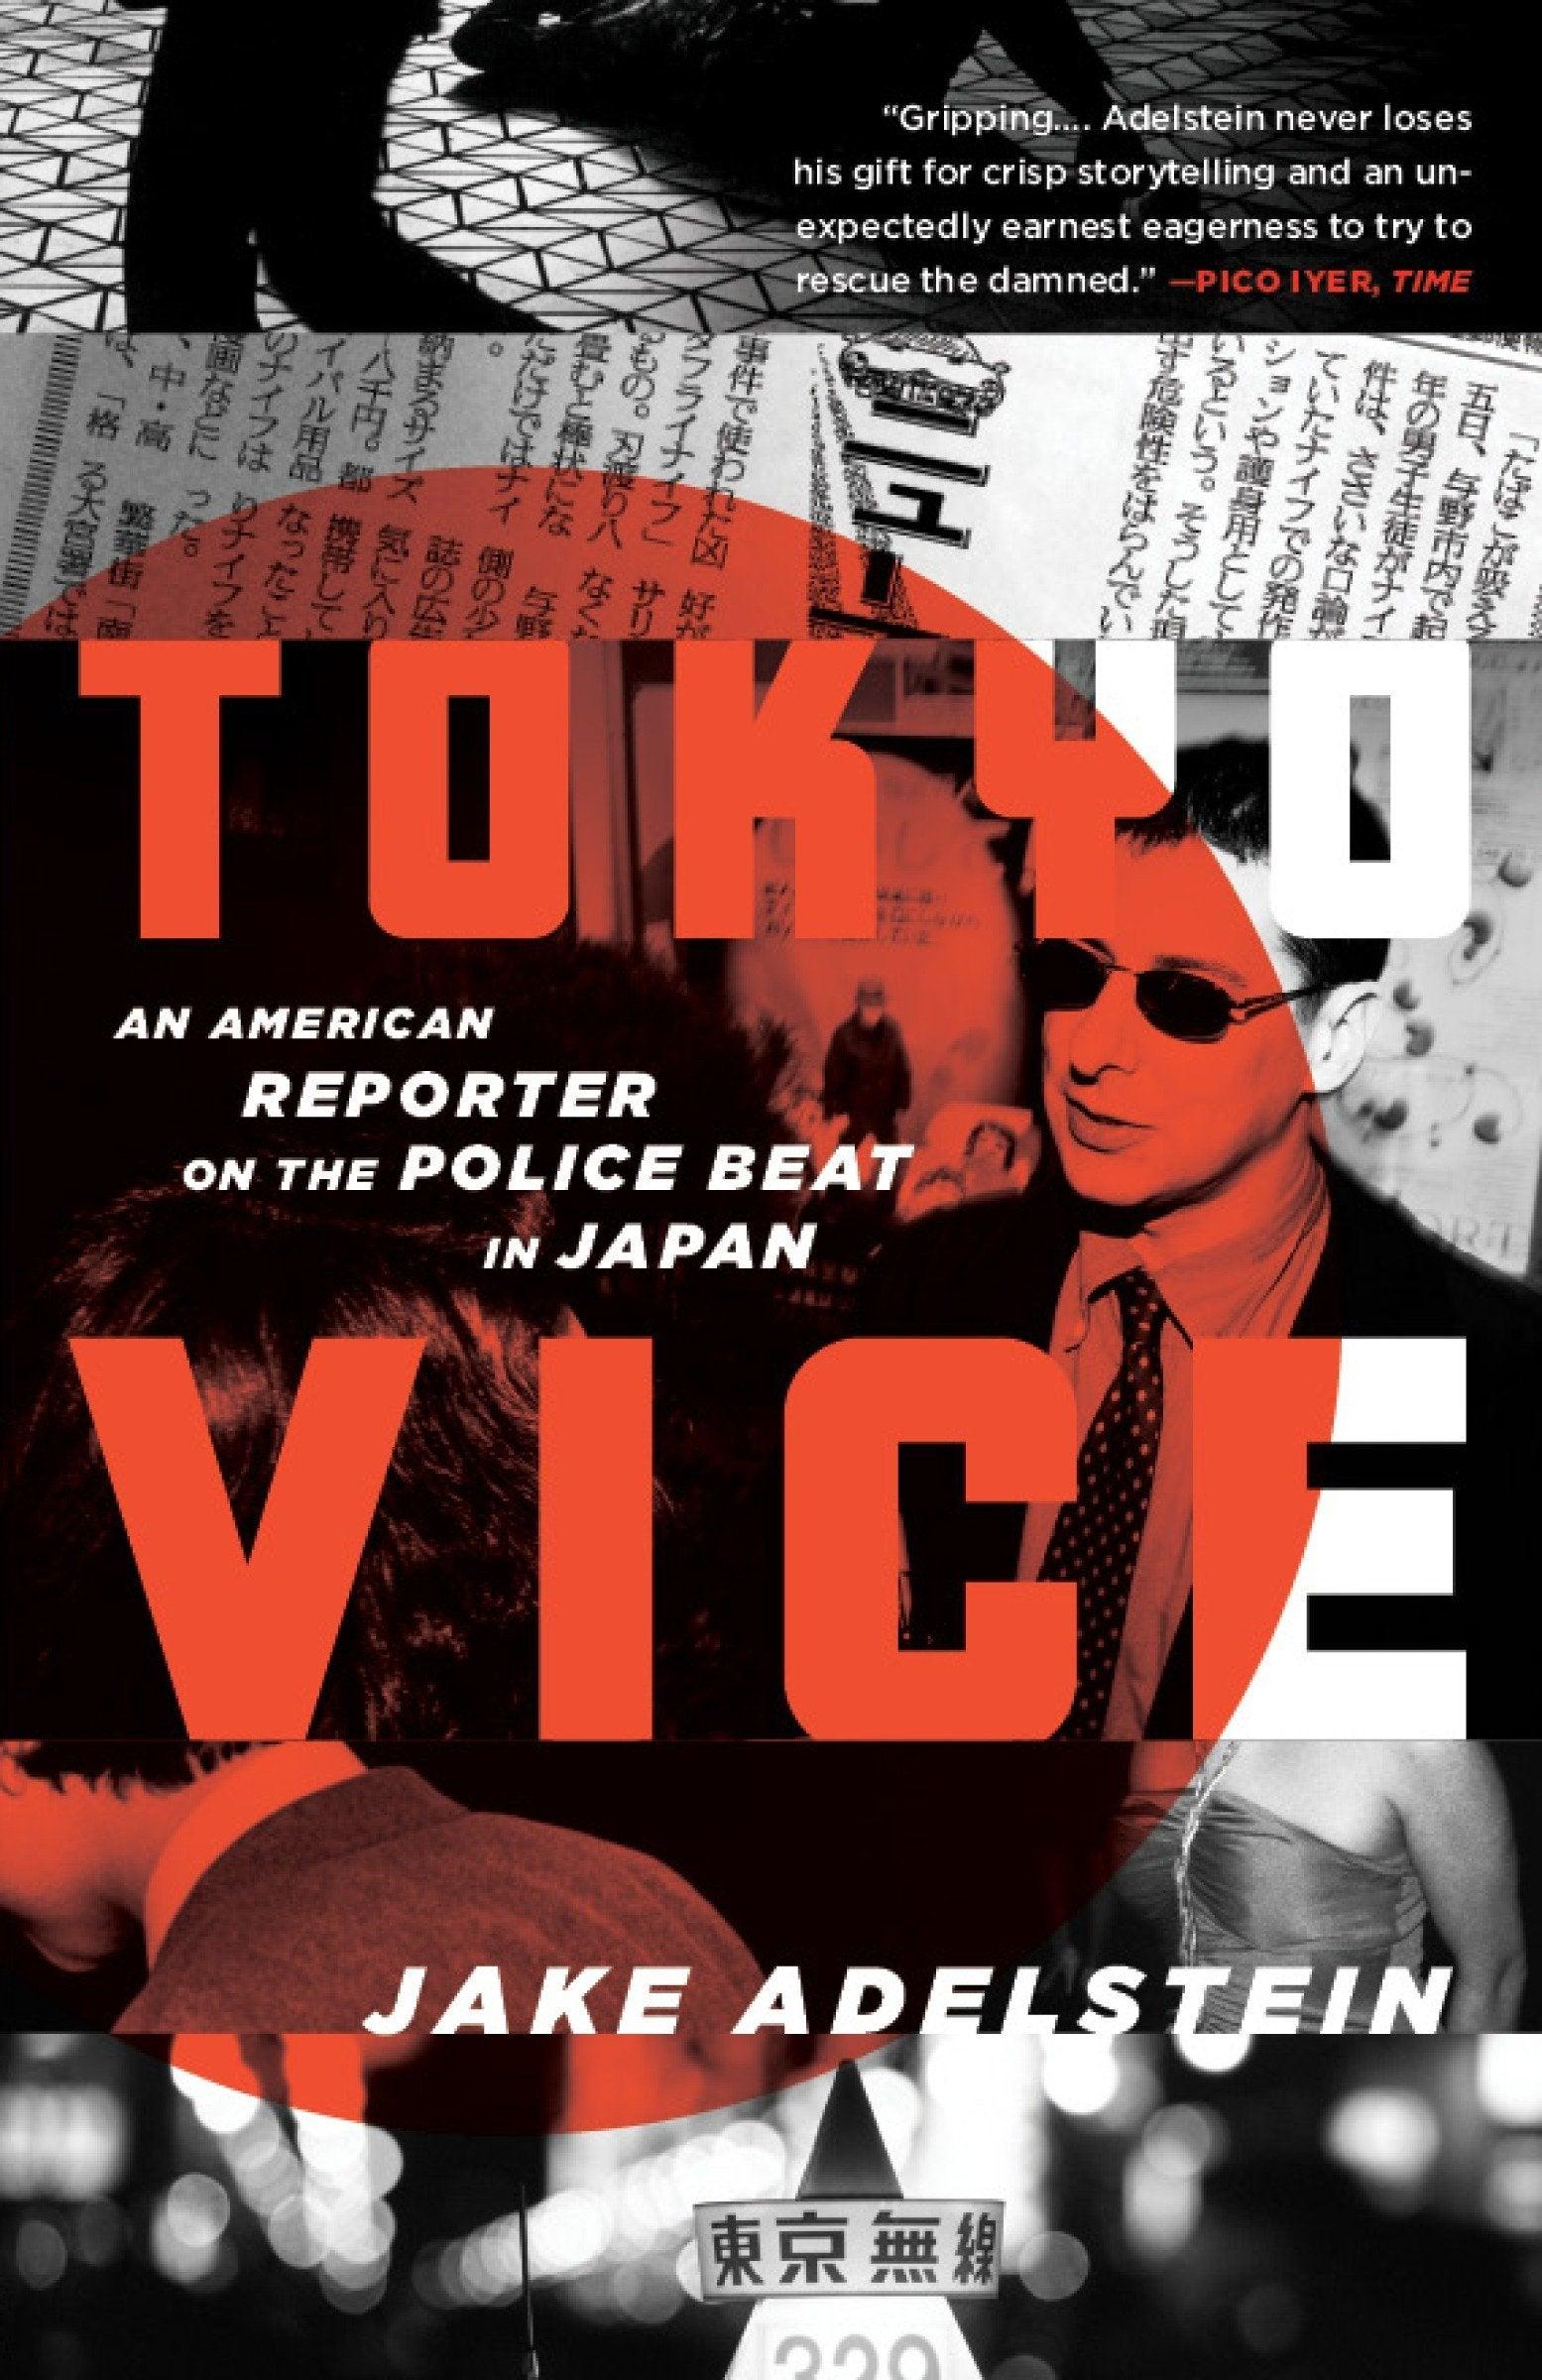 La novela en la que se basará la serie de Michael Mann.